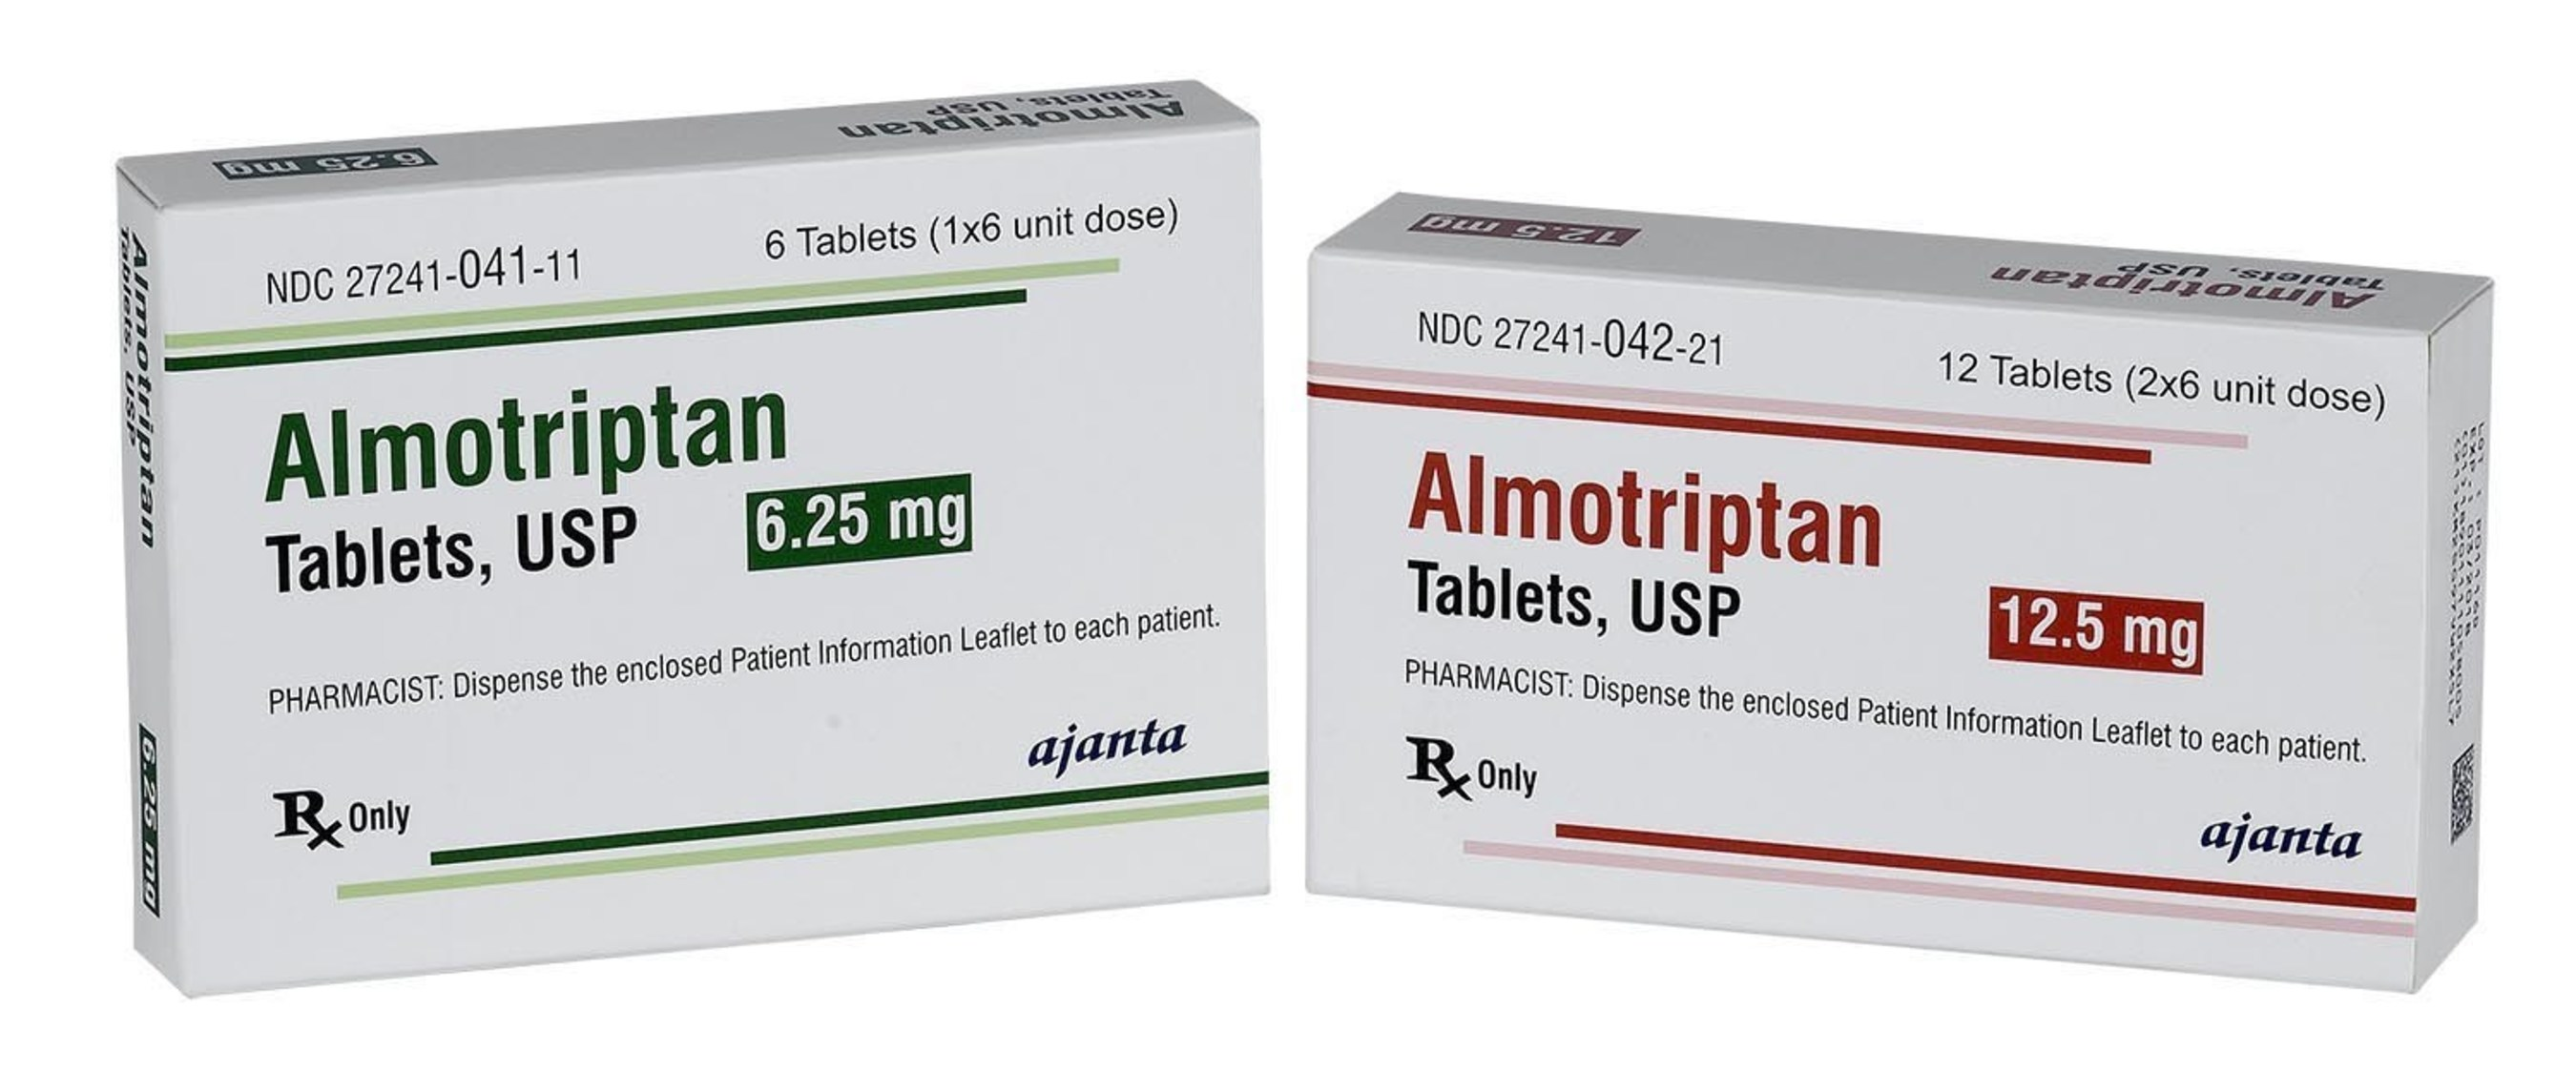 Ajanta Pharma Announces the Launch of Almotriptan Malate Tablets